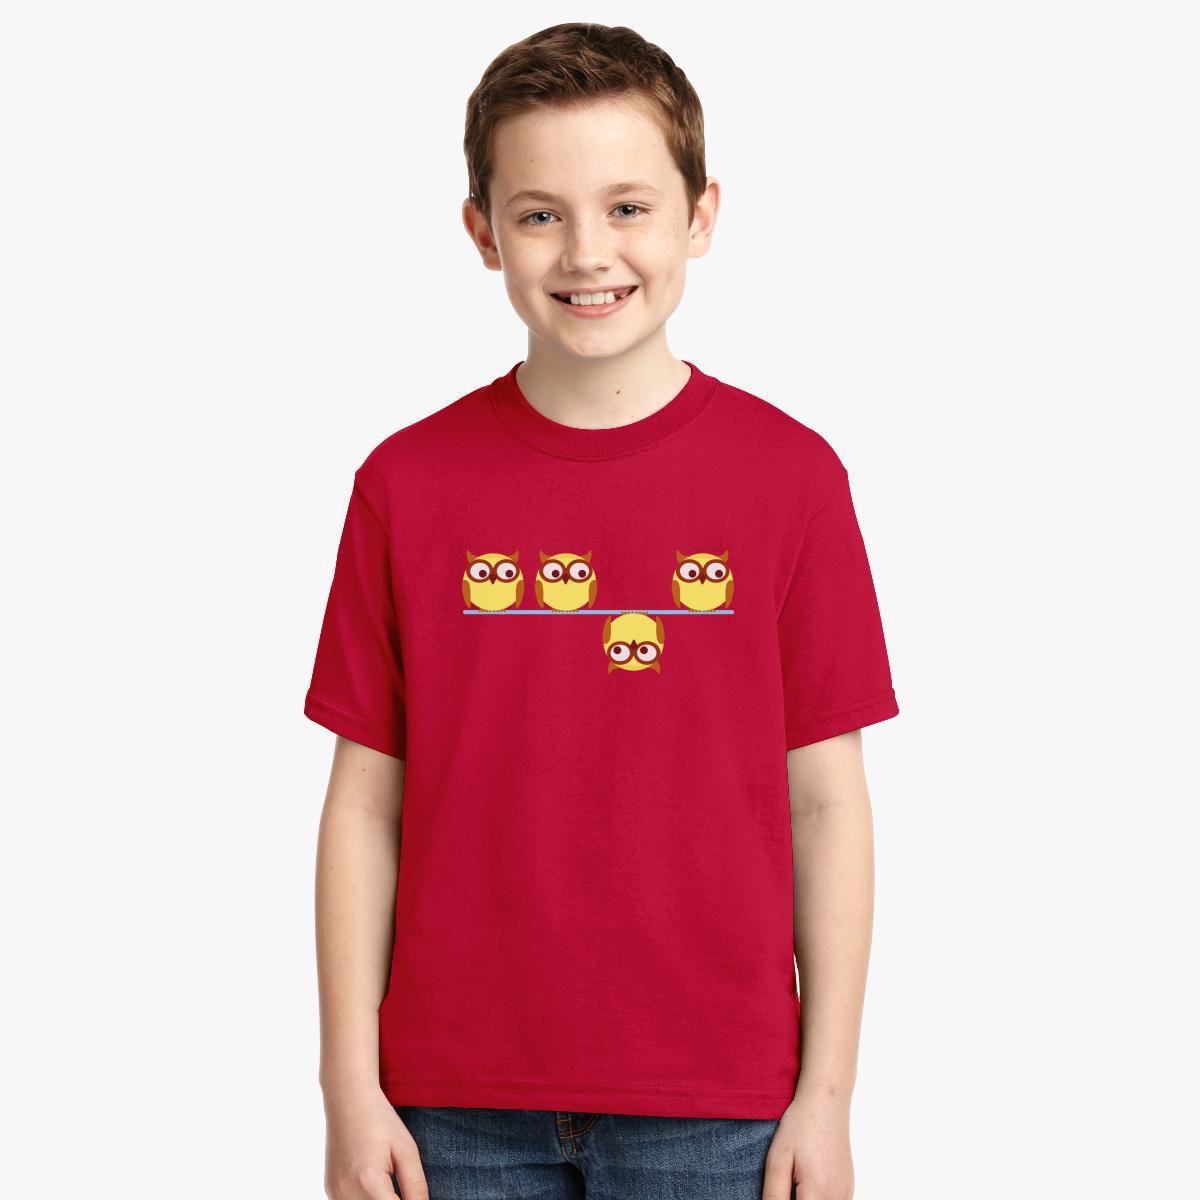 Sweet Owls Youth T-shirt - Customon